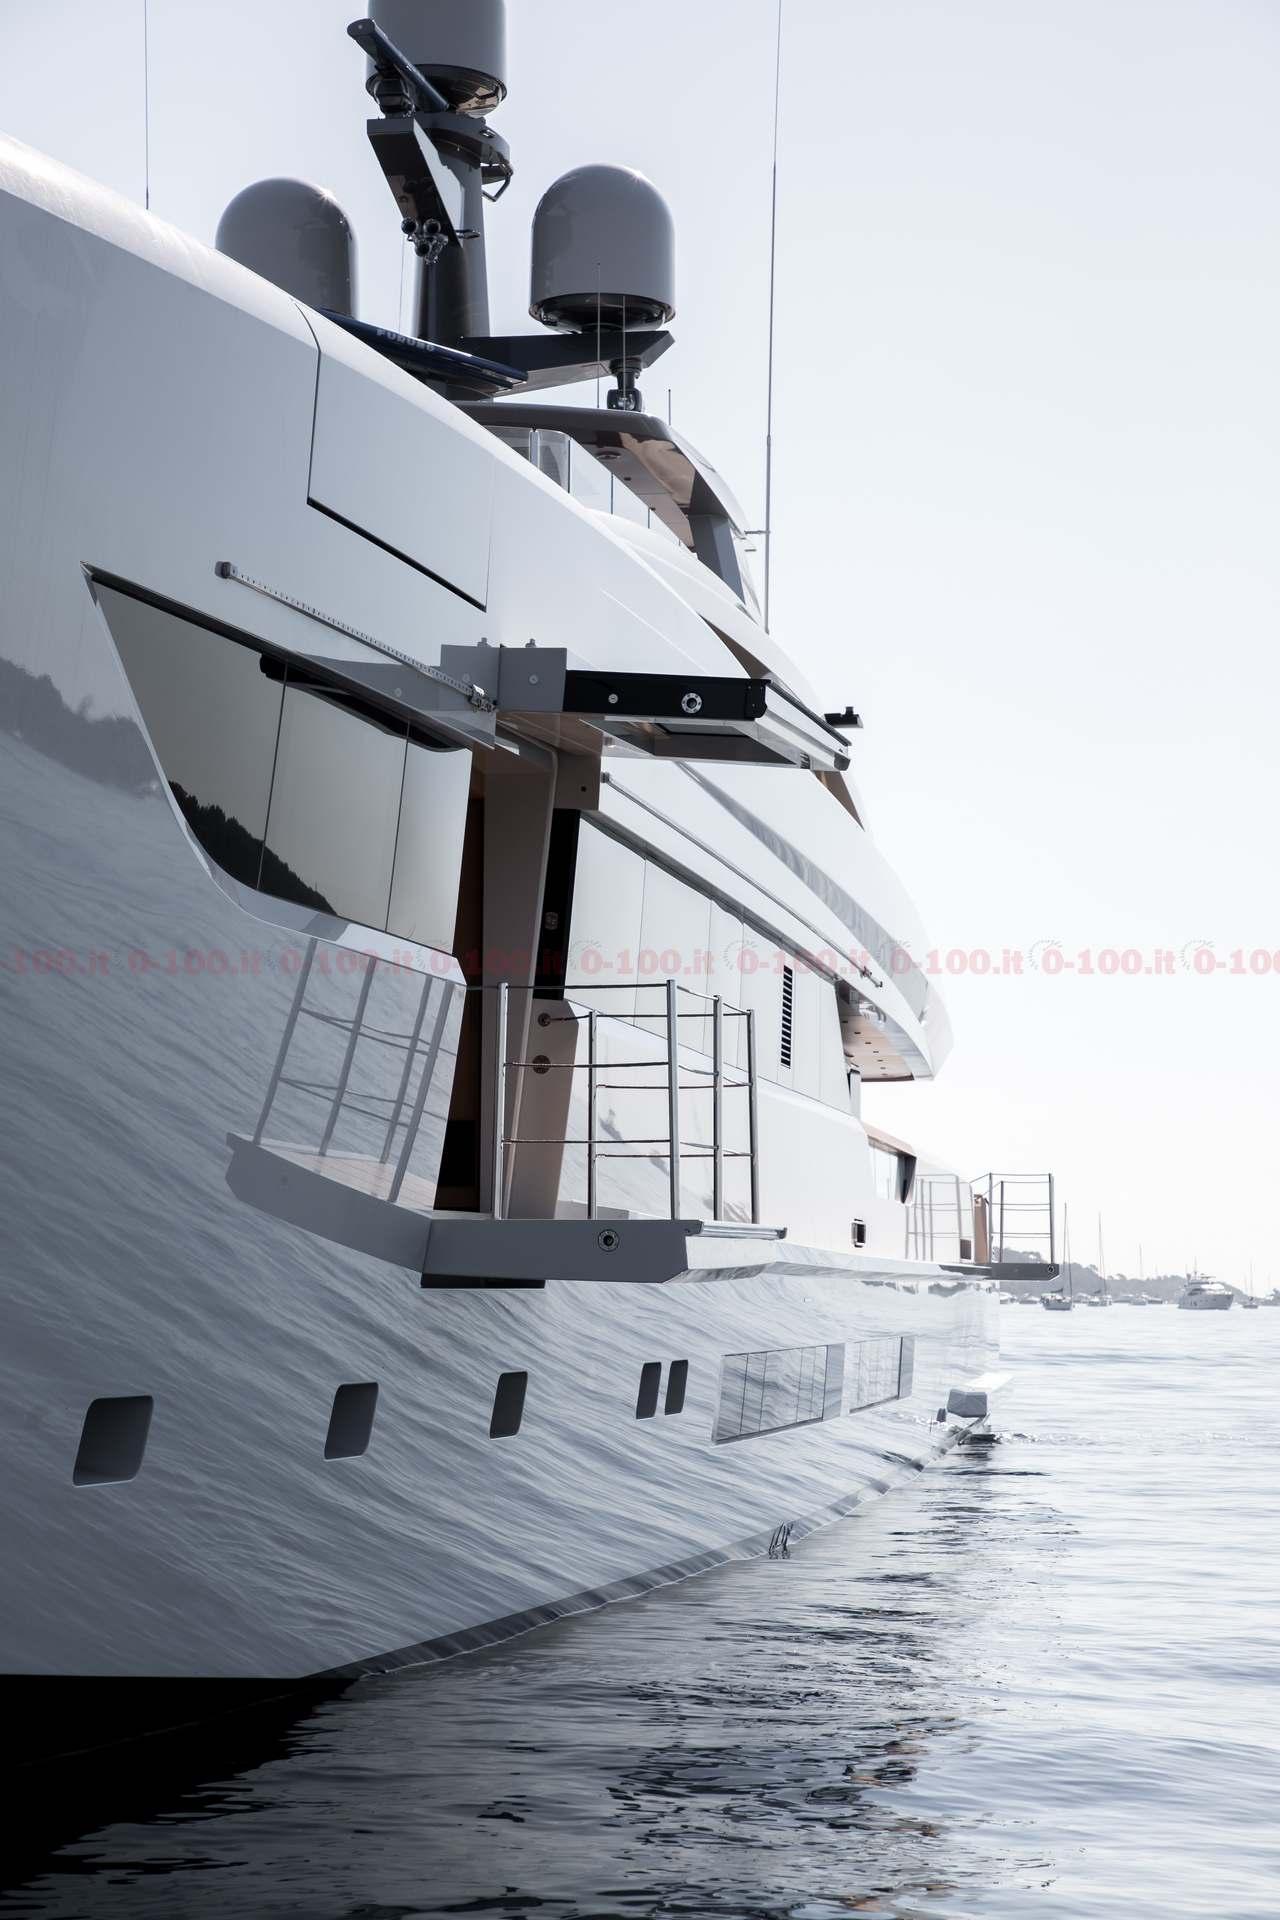 Monaco Yacht Show 2017_ S501 Tankoa Yachts M_Y Vertige_0-10020